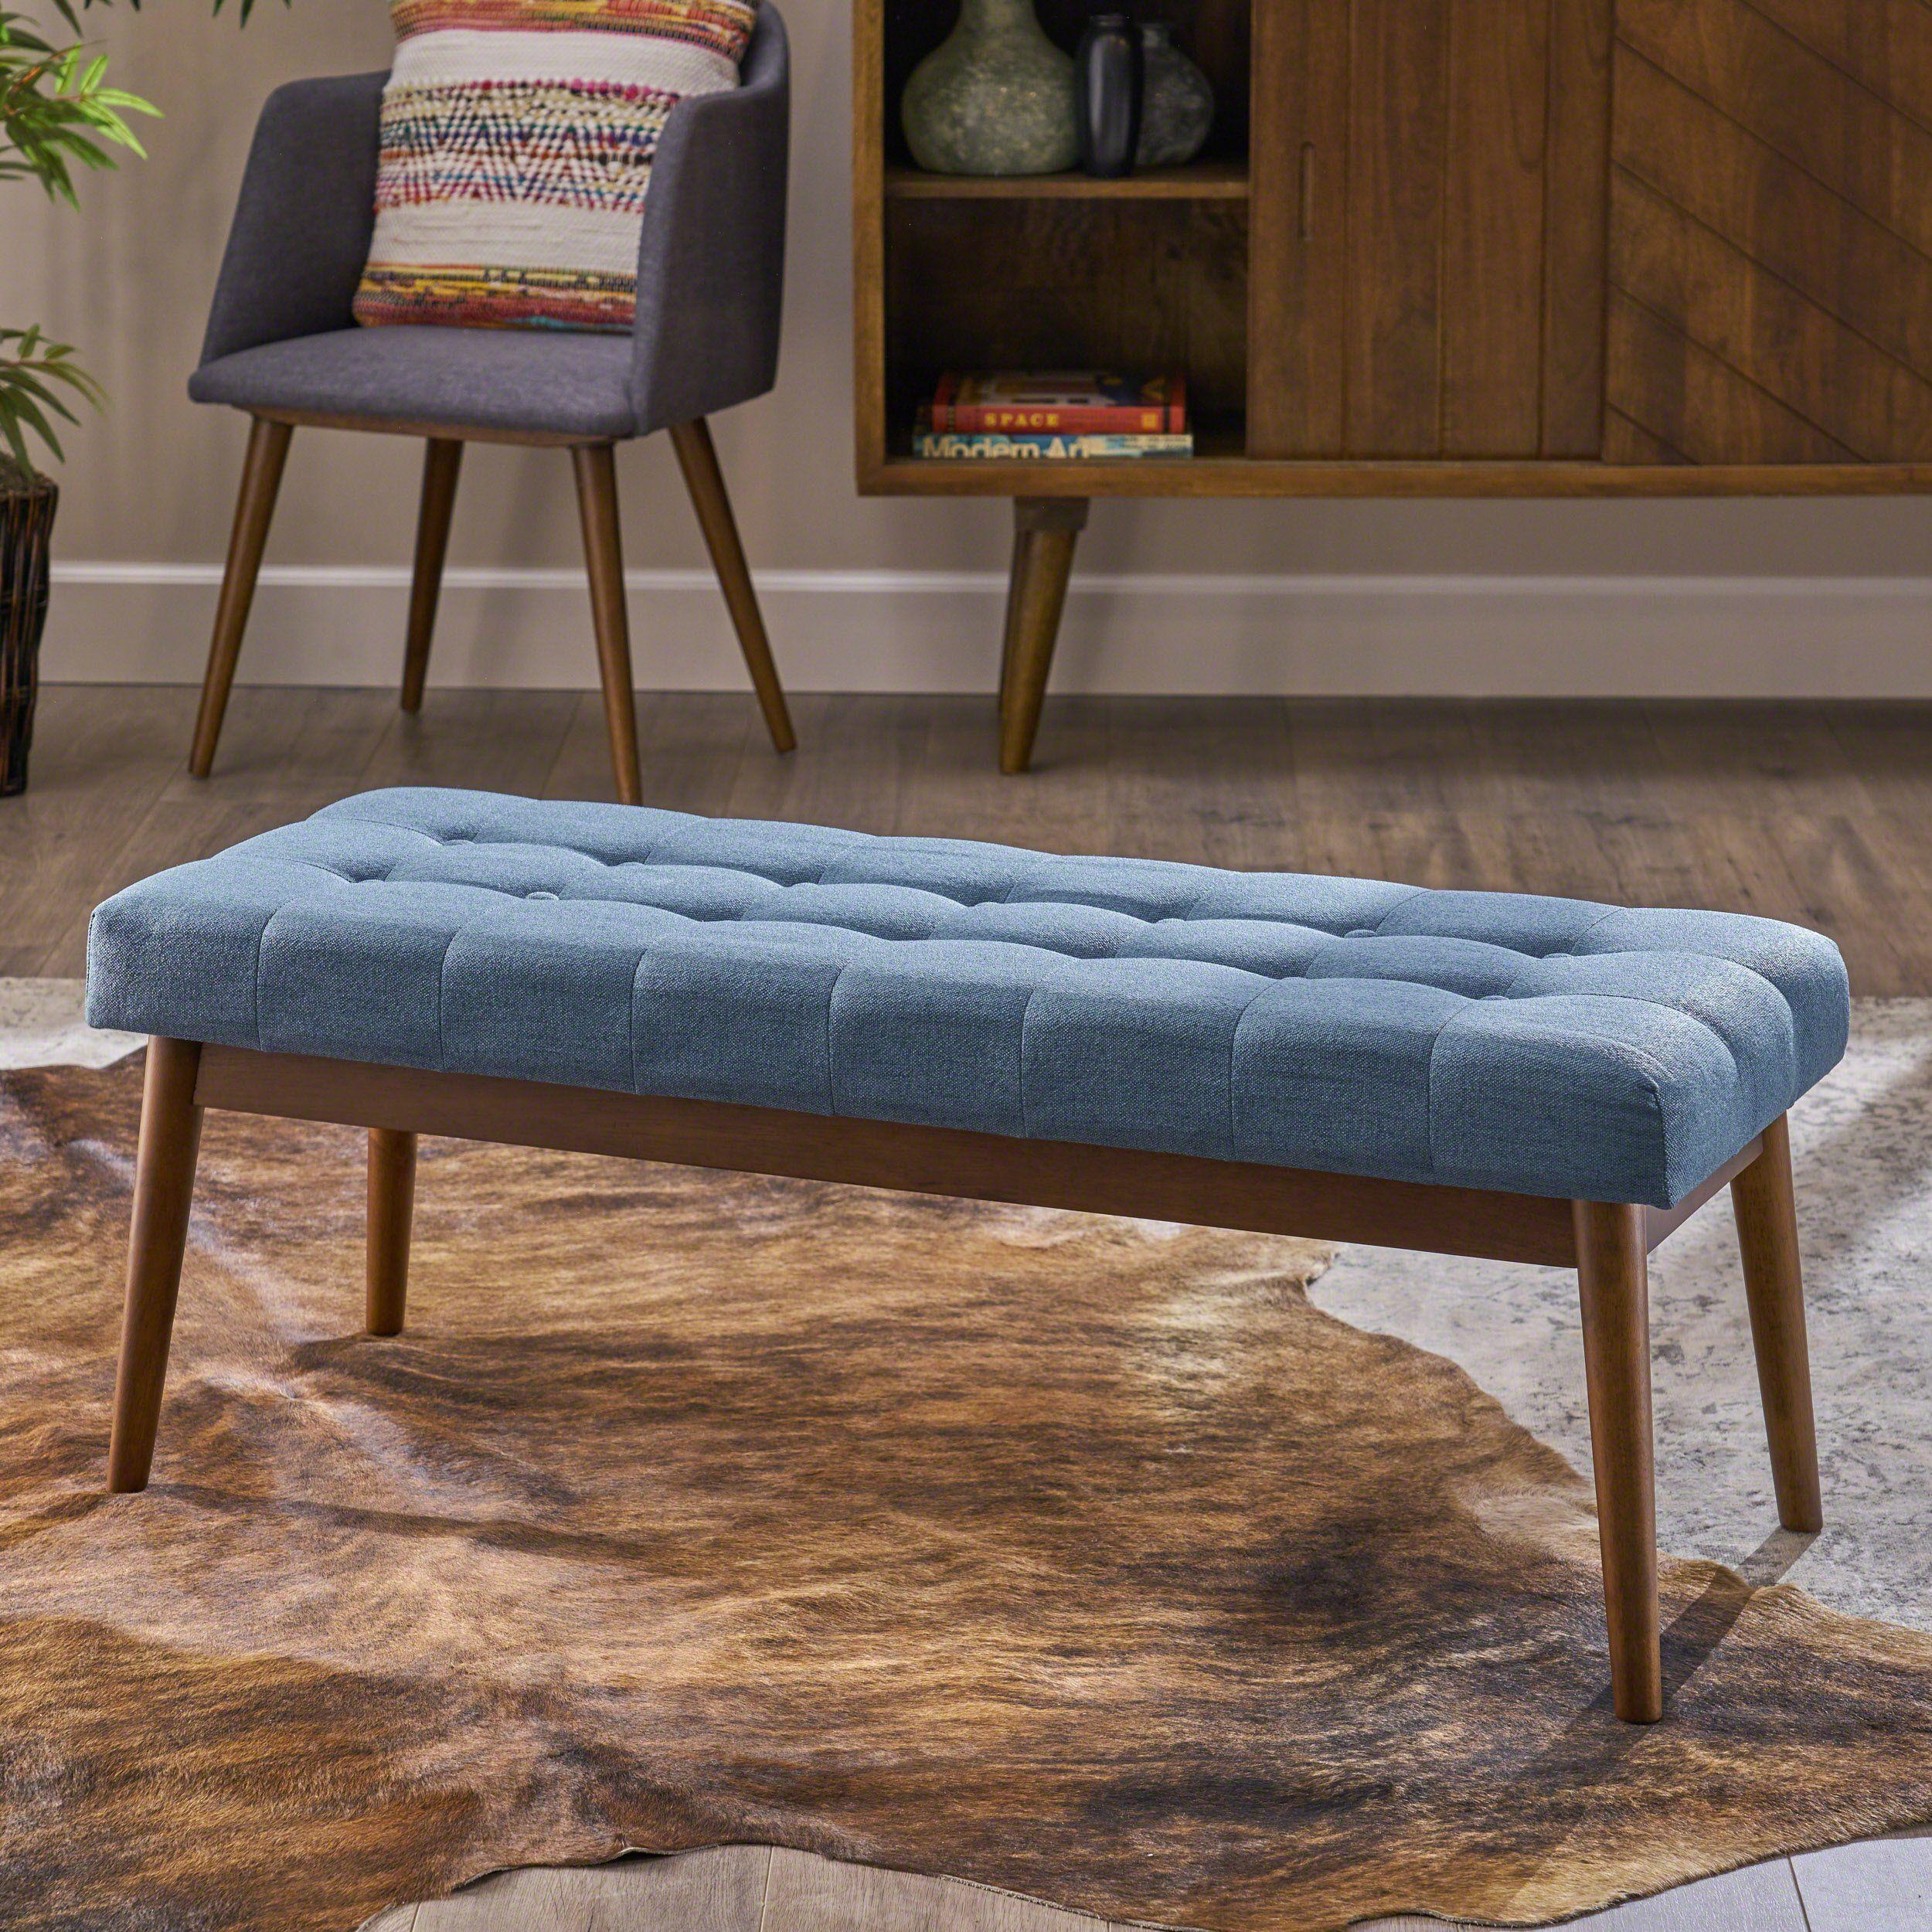 Flora Mid Century Button Tufted Fabric Ottoman Bench With Tapered Legs Fabric Ottoman Ottoman Ottoman Bench